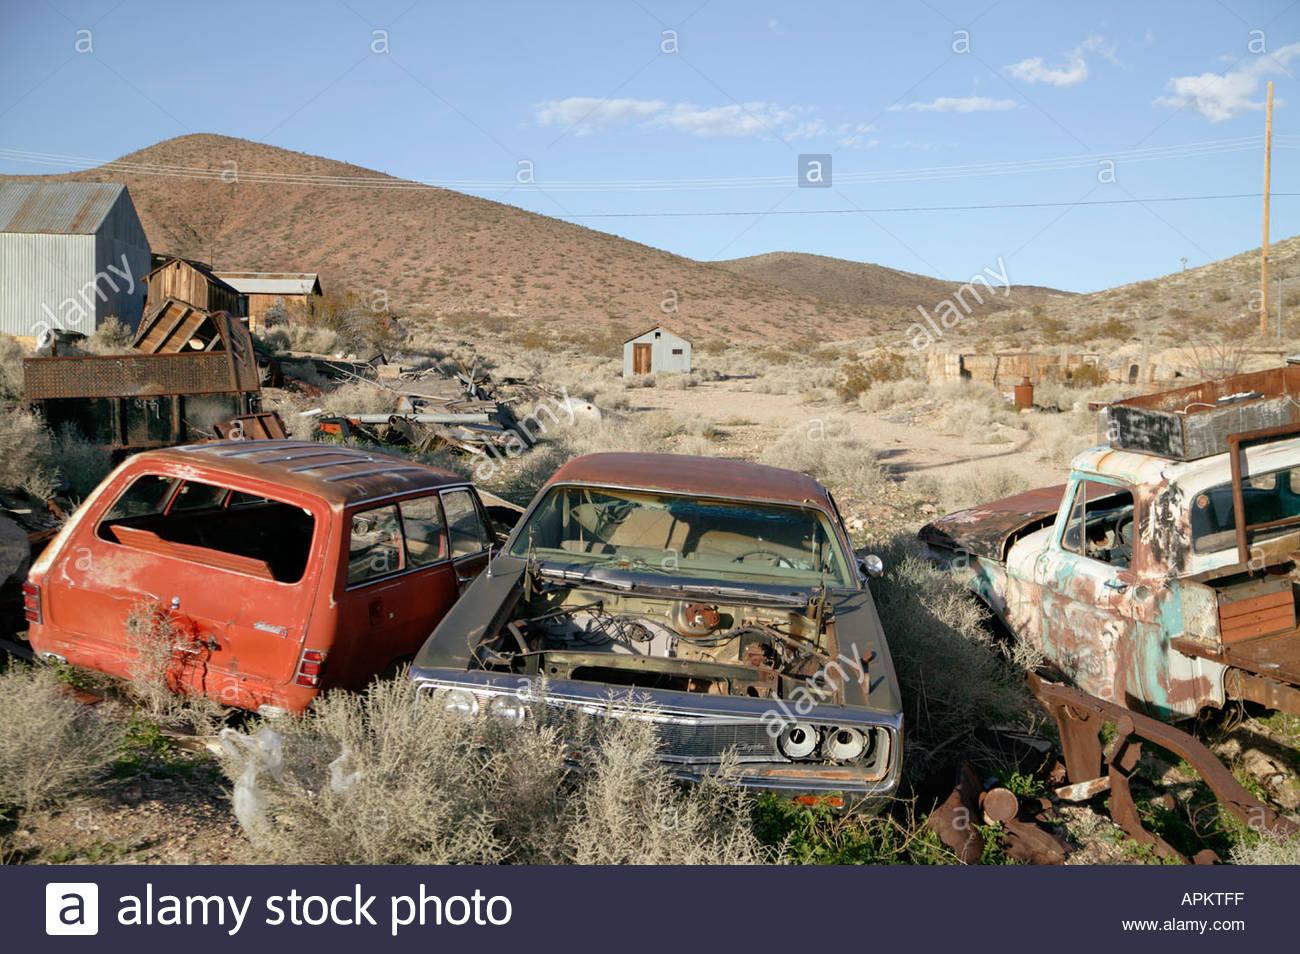 Junk cars. (Darwin, California, USA Stock Photo: 5164286 - Alamy